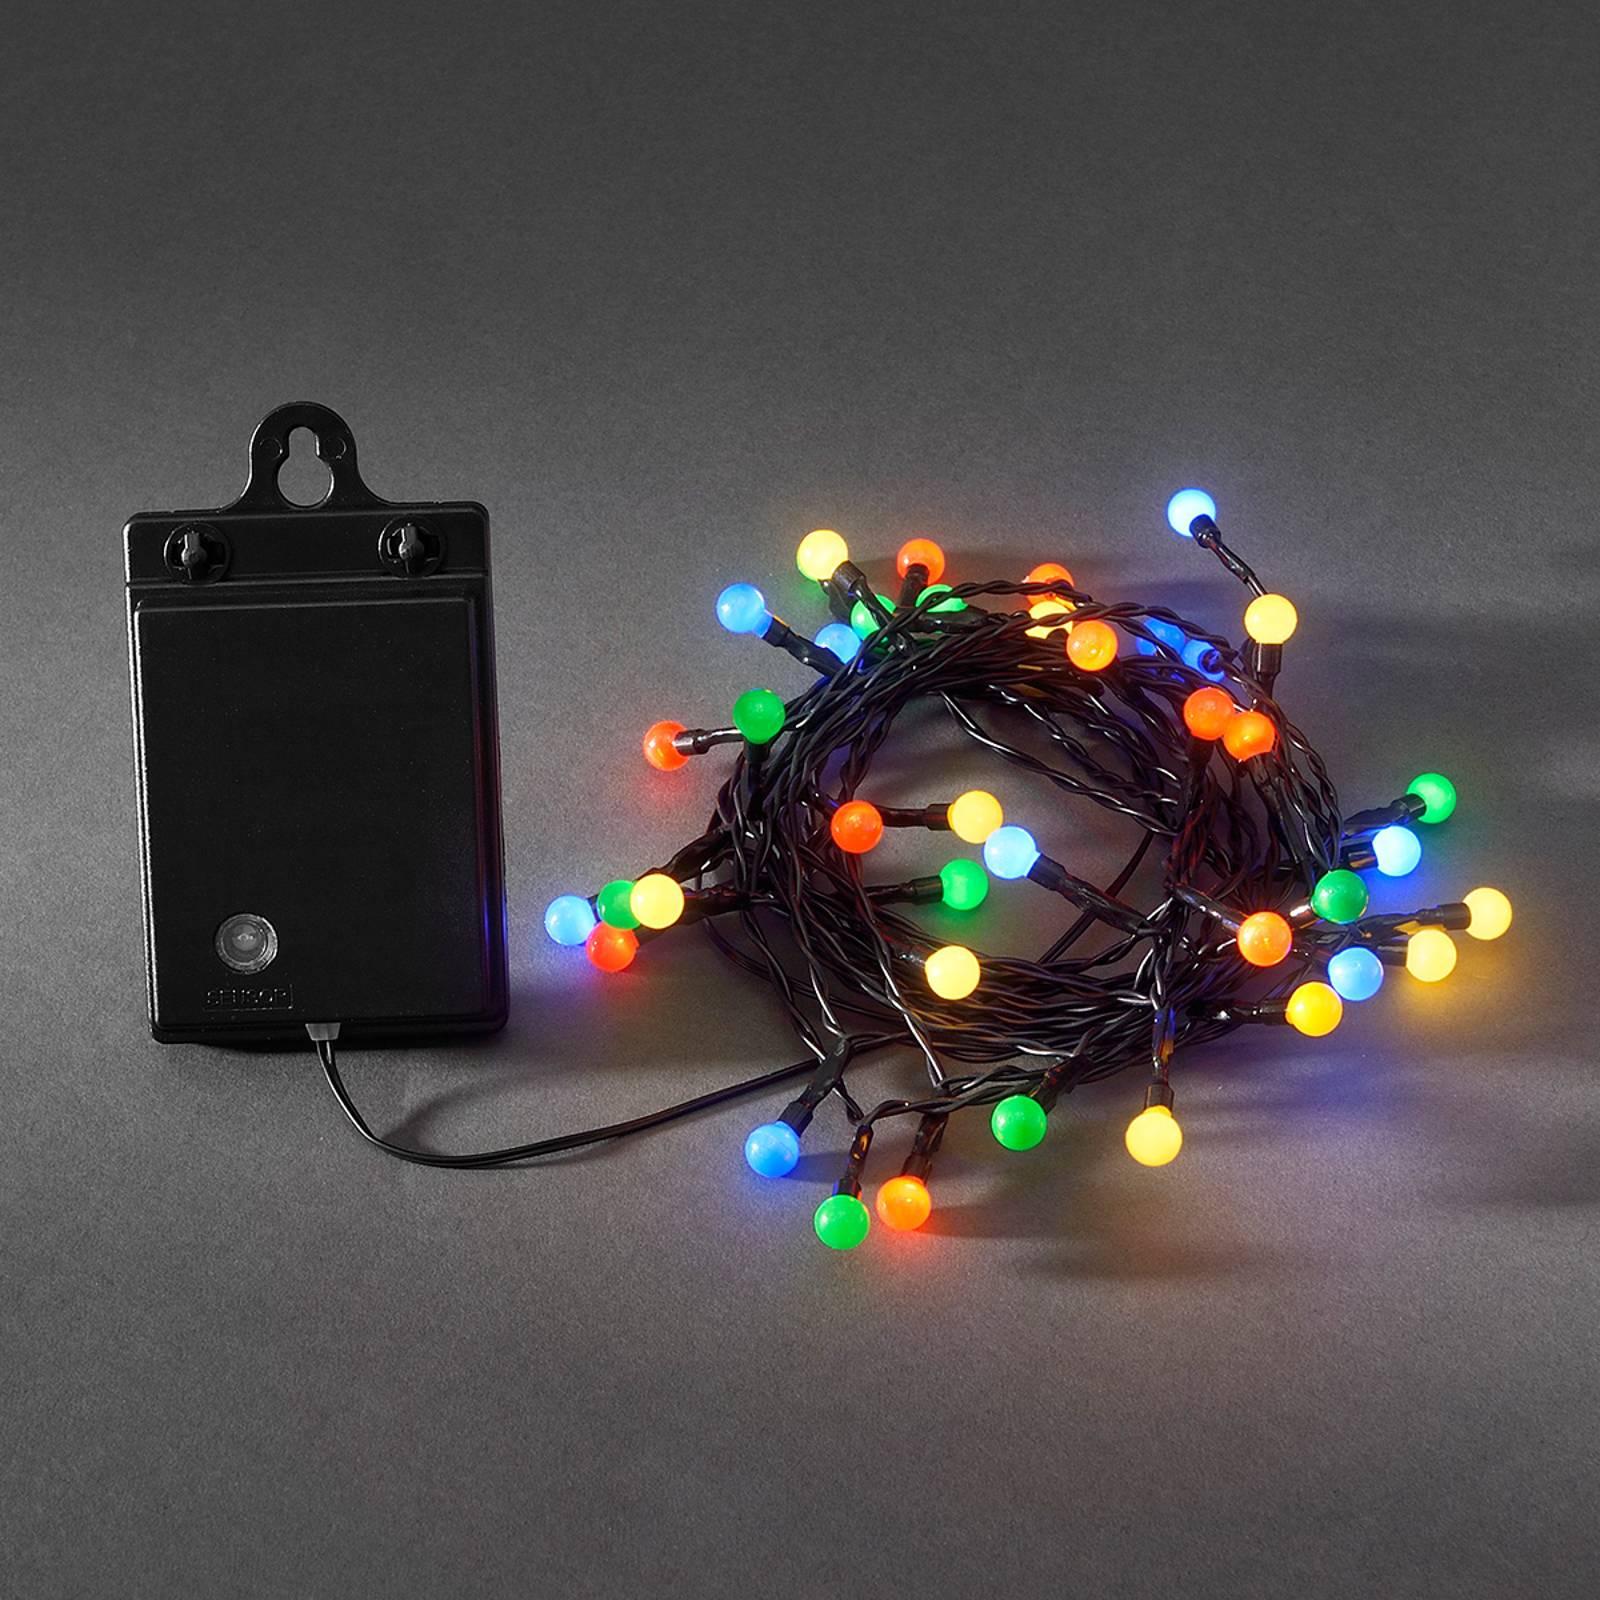 Image of Guirlande lumin. LED multicolore à 40 lampes RVB 07318303740503